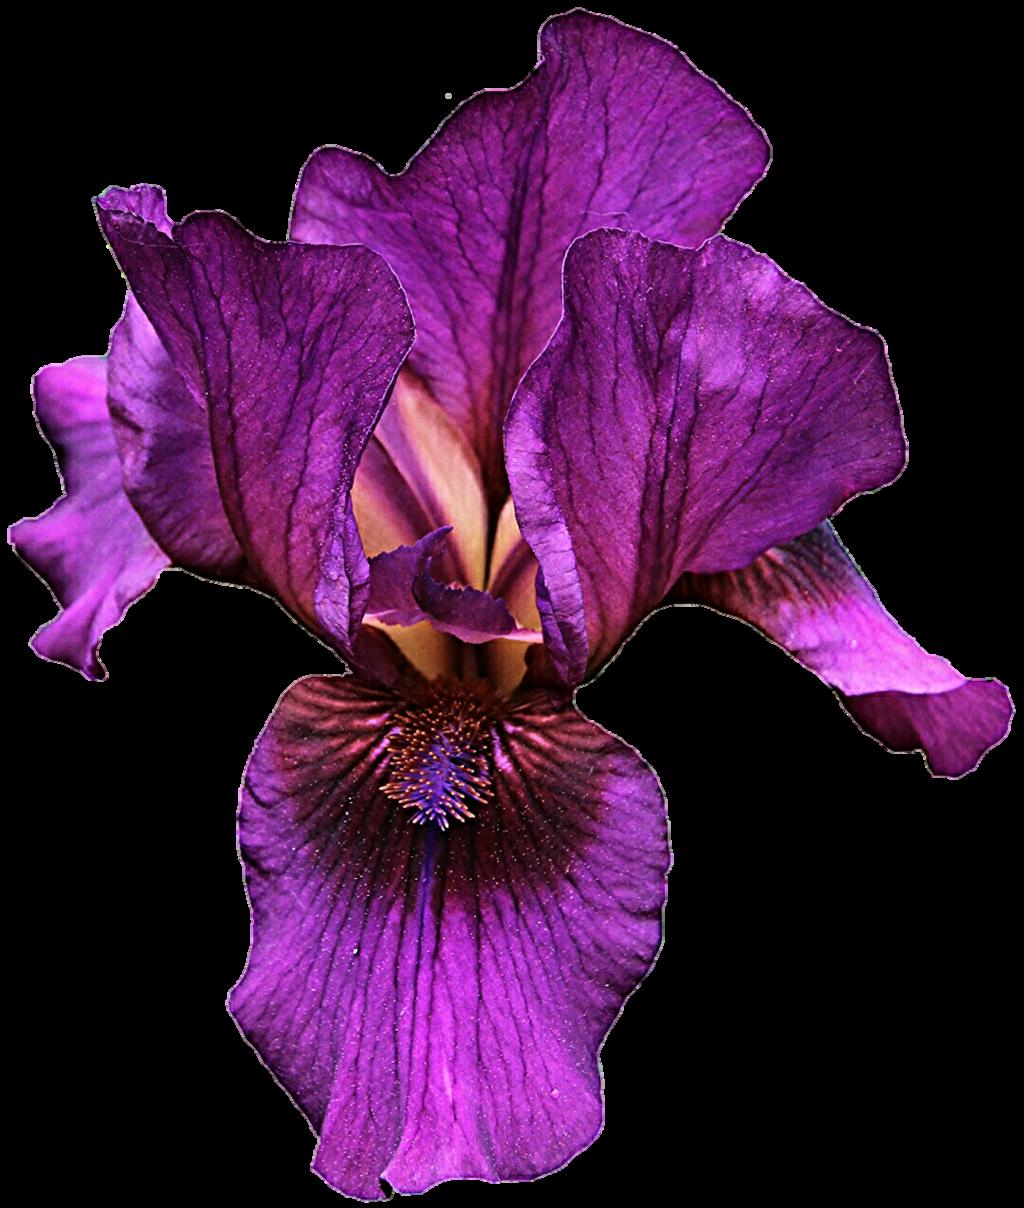 1024x1208 Iris Flower Png Hd Transparent Iris Flower Hd.png Images. Pluspng